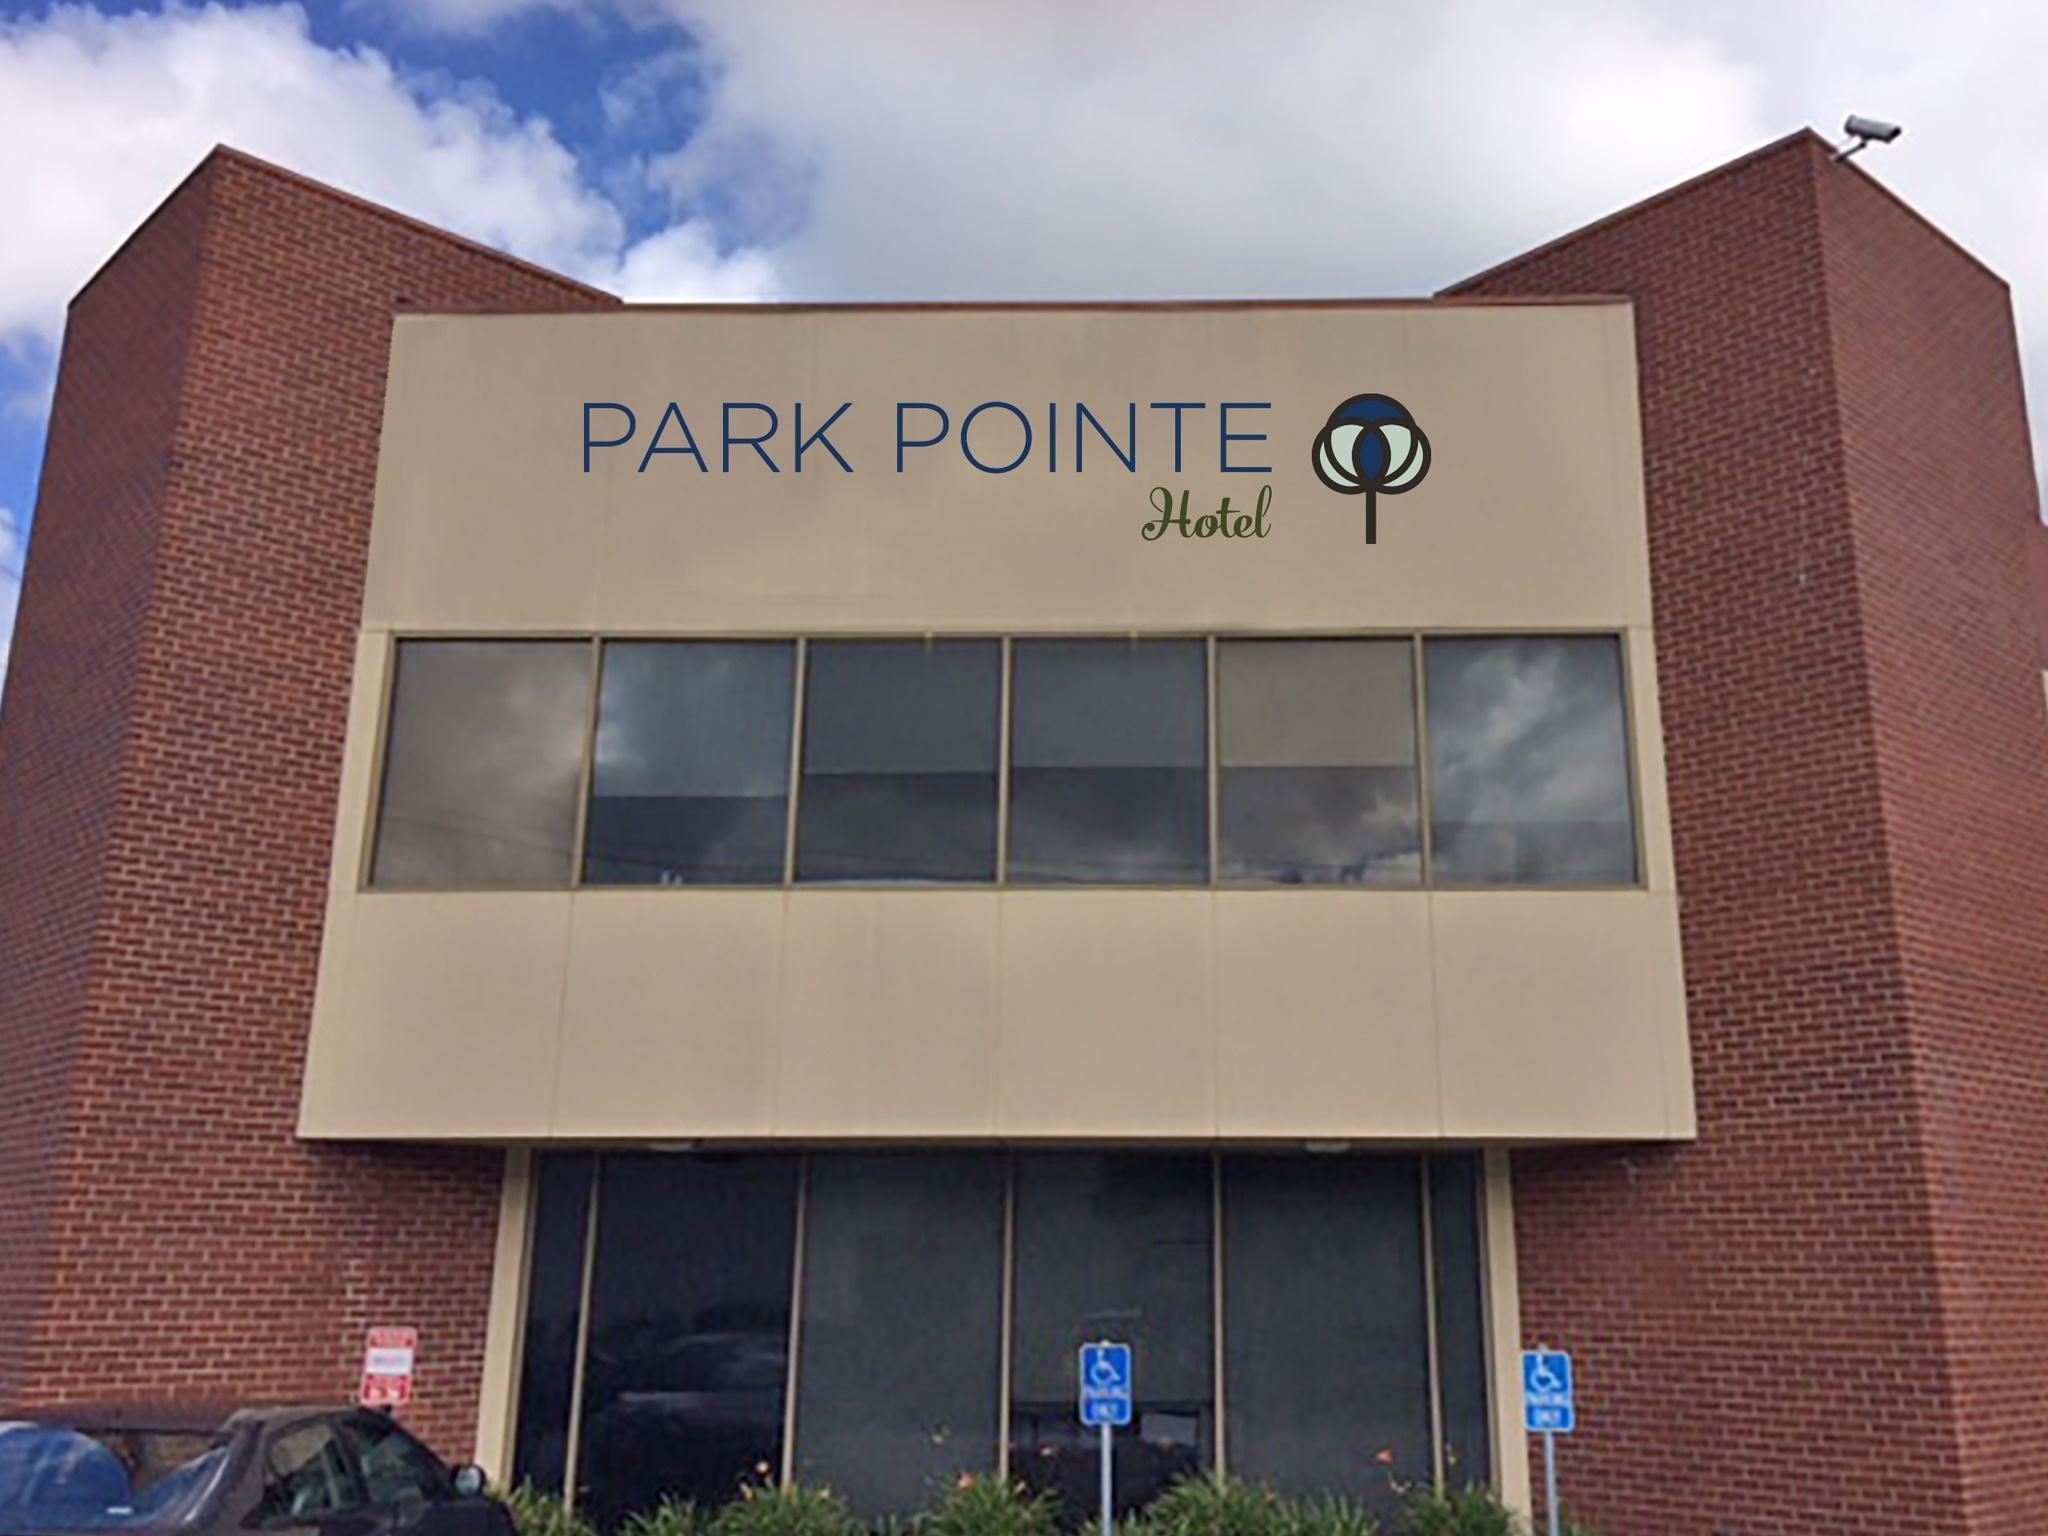 Park Pointe Hotel